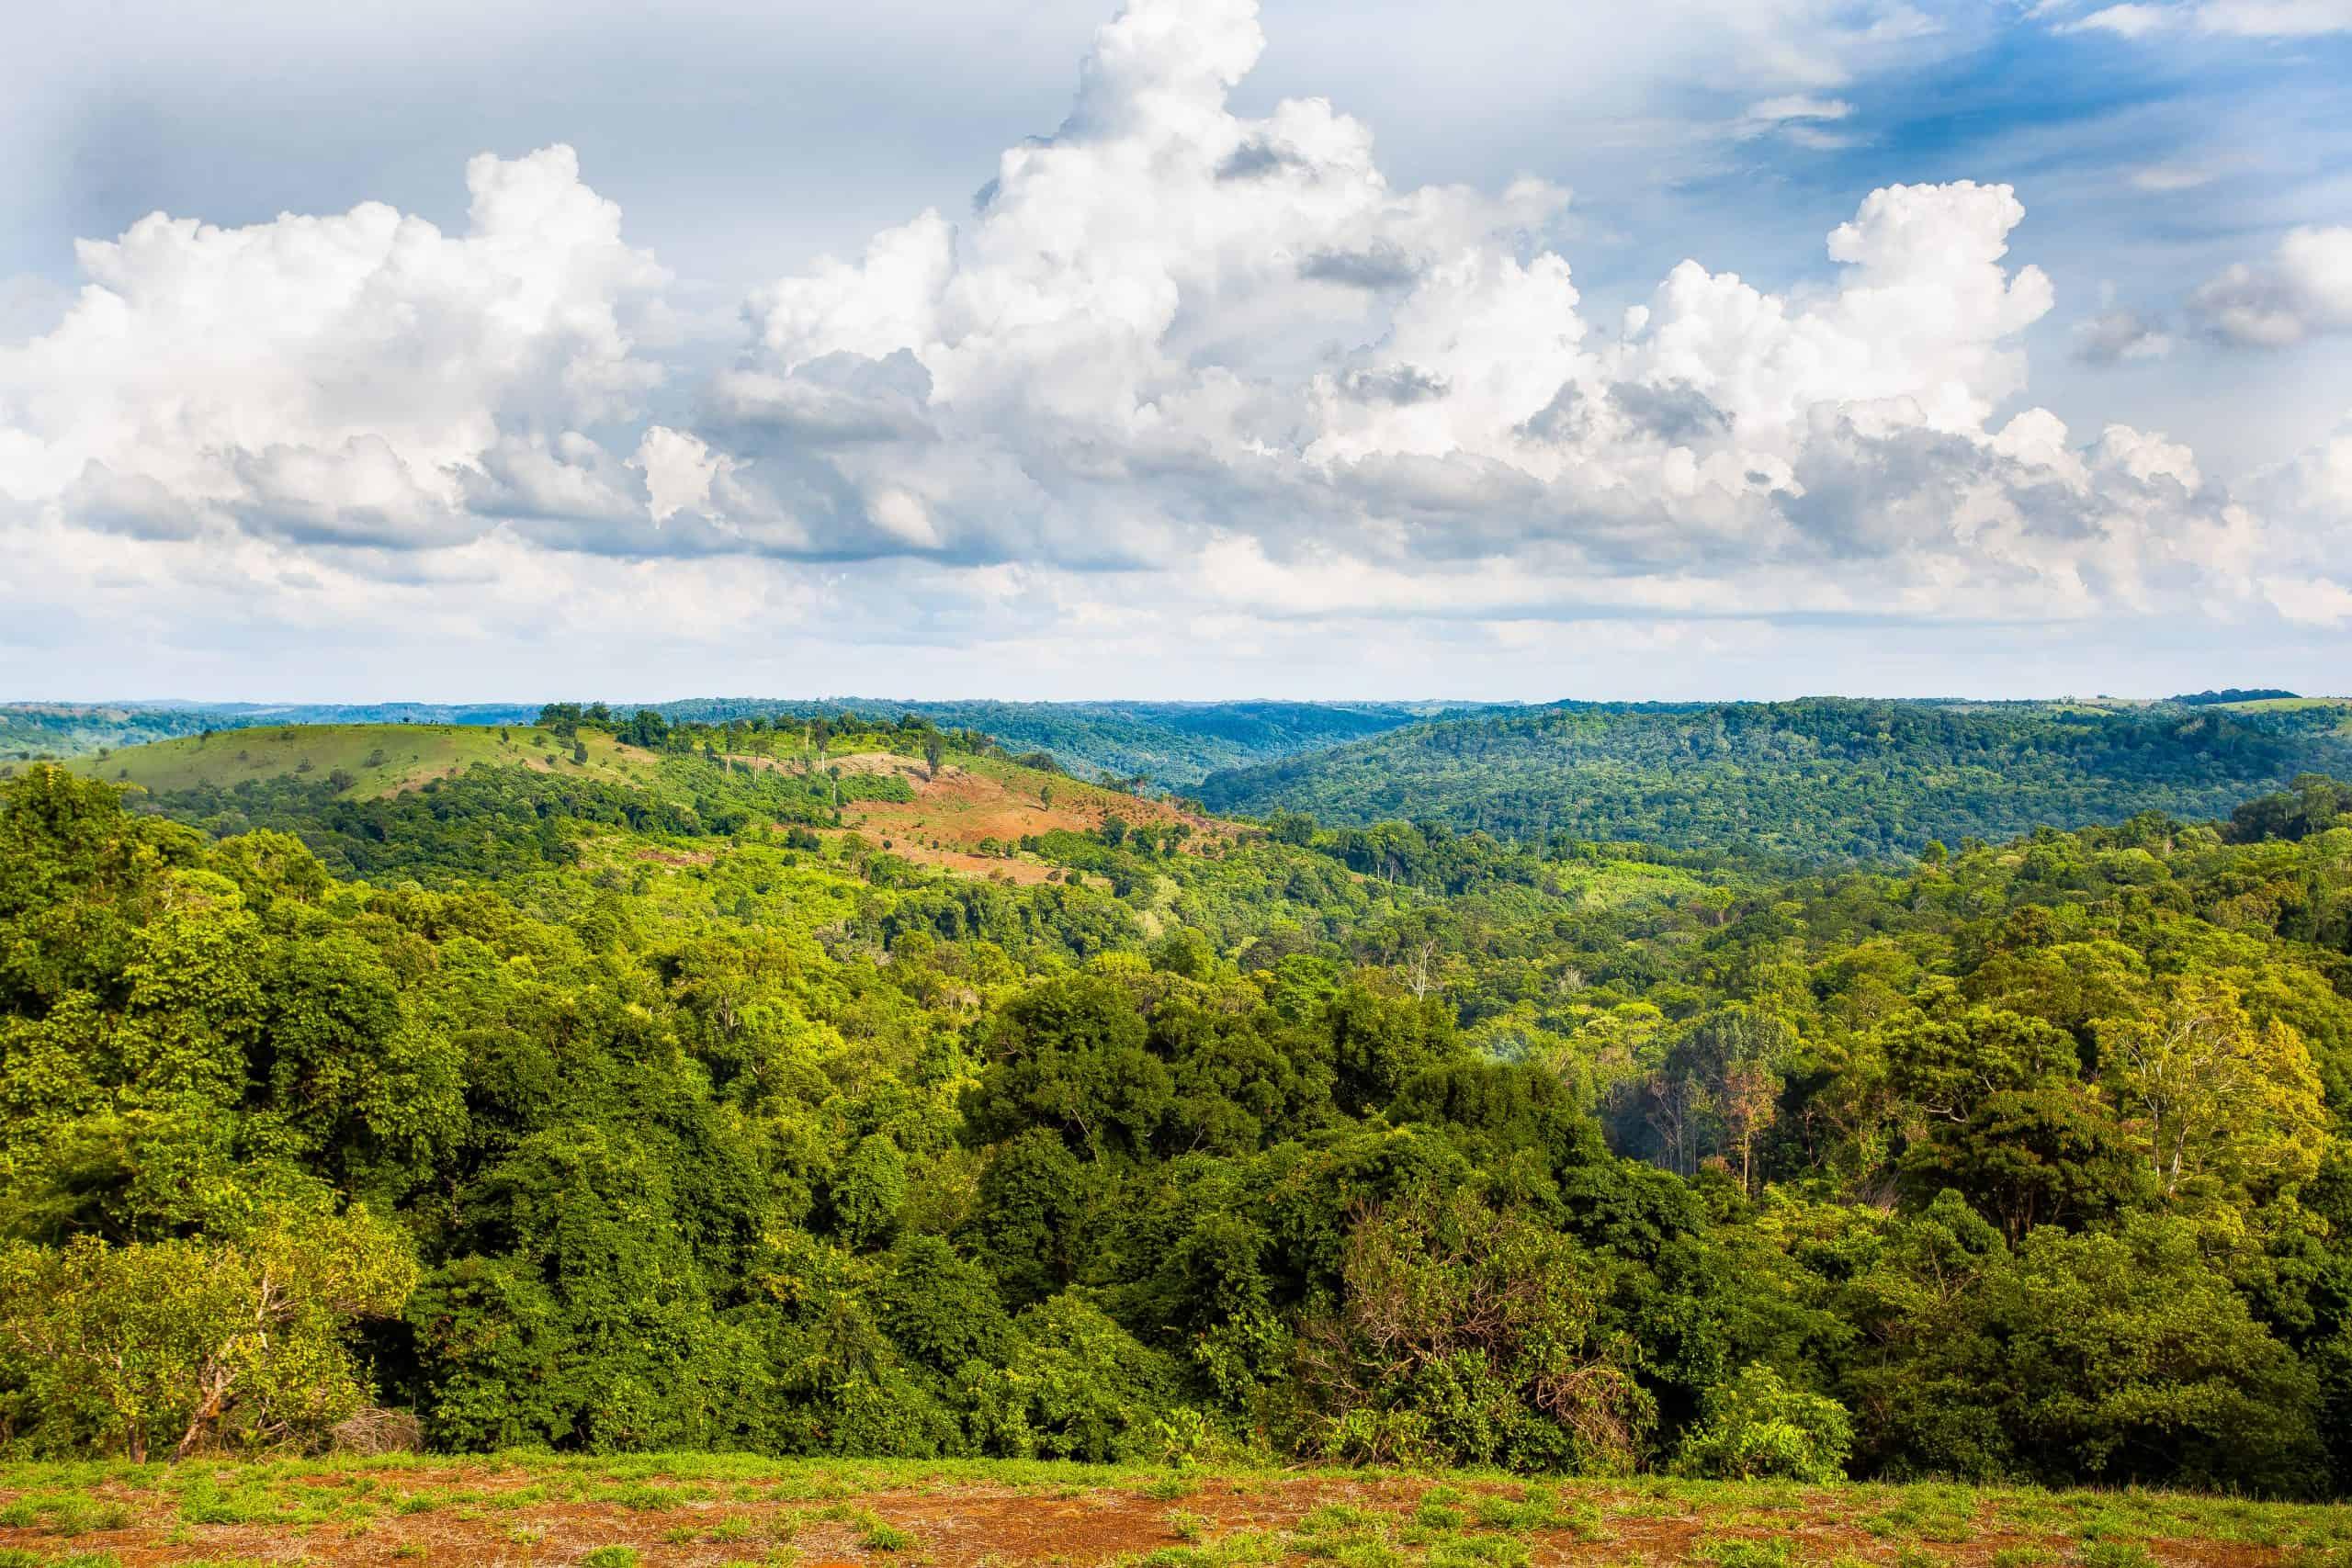 Landscape and forest in the Keo Seima project, Cambodia.